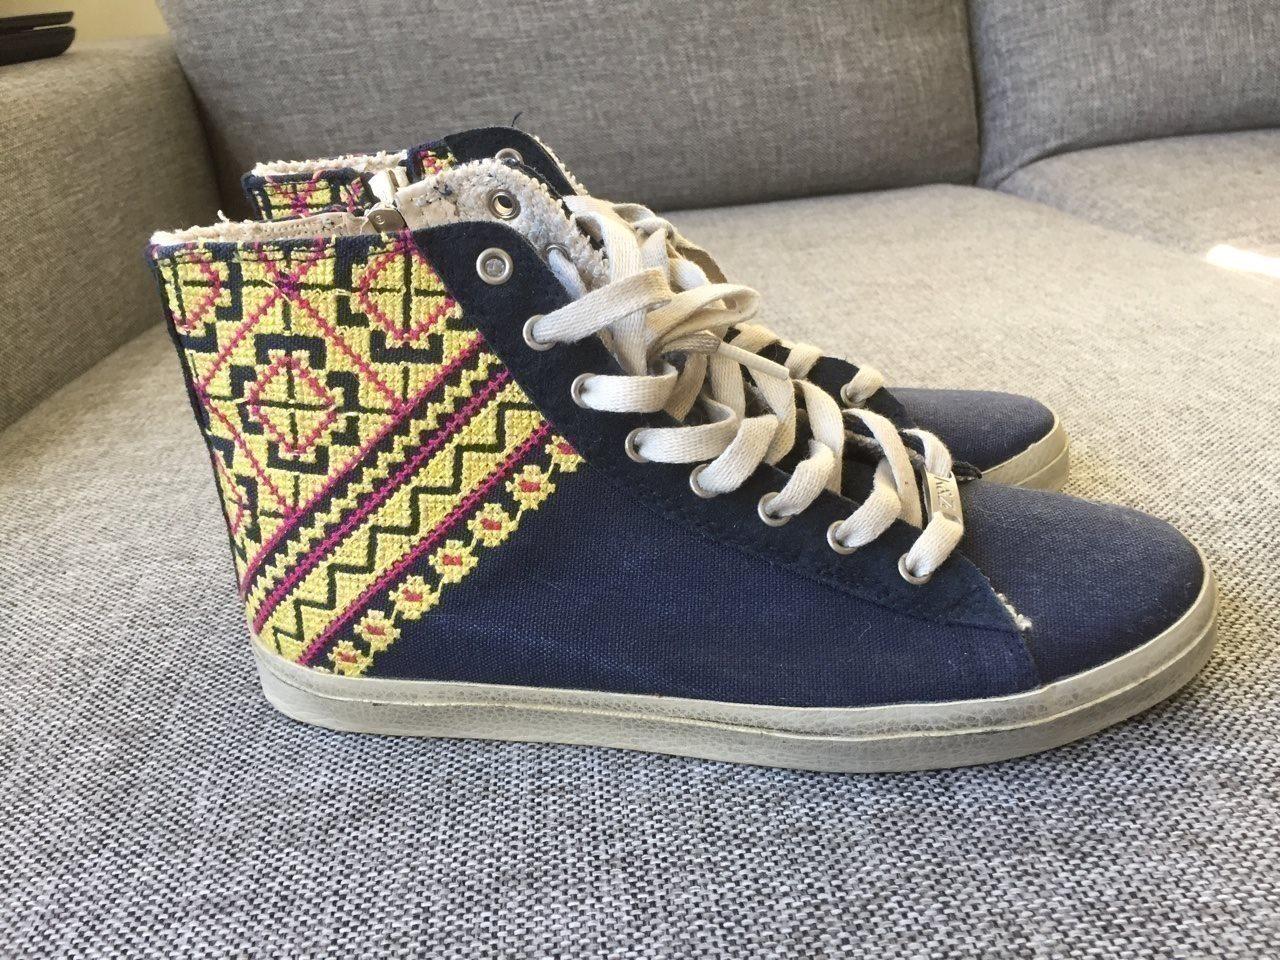 ff3bfe80cd5 Sneakers Kim & Zozi storlek 37-38 (343163650) ᐈ Köp på Tradera